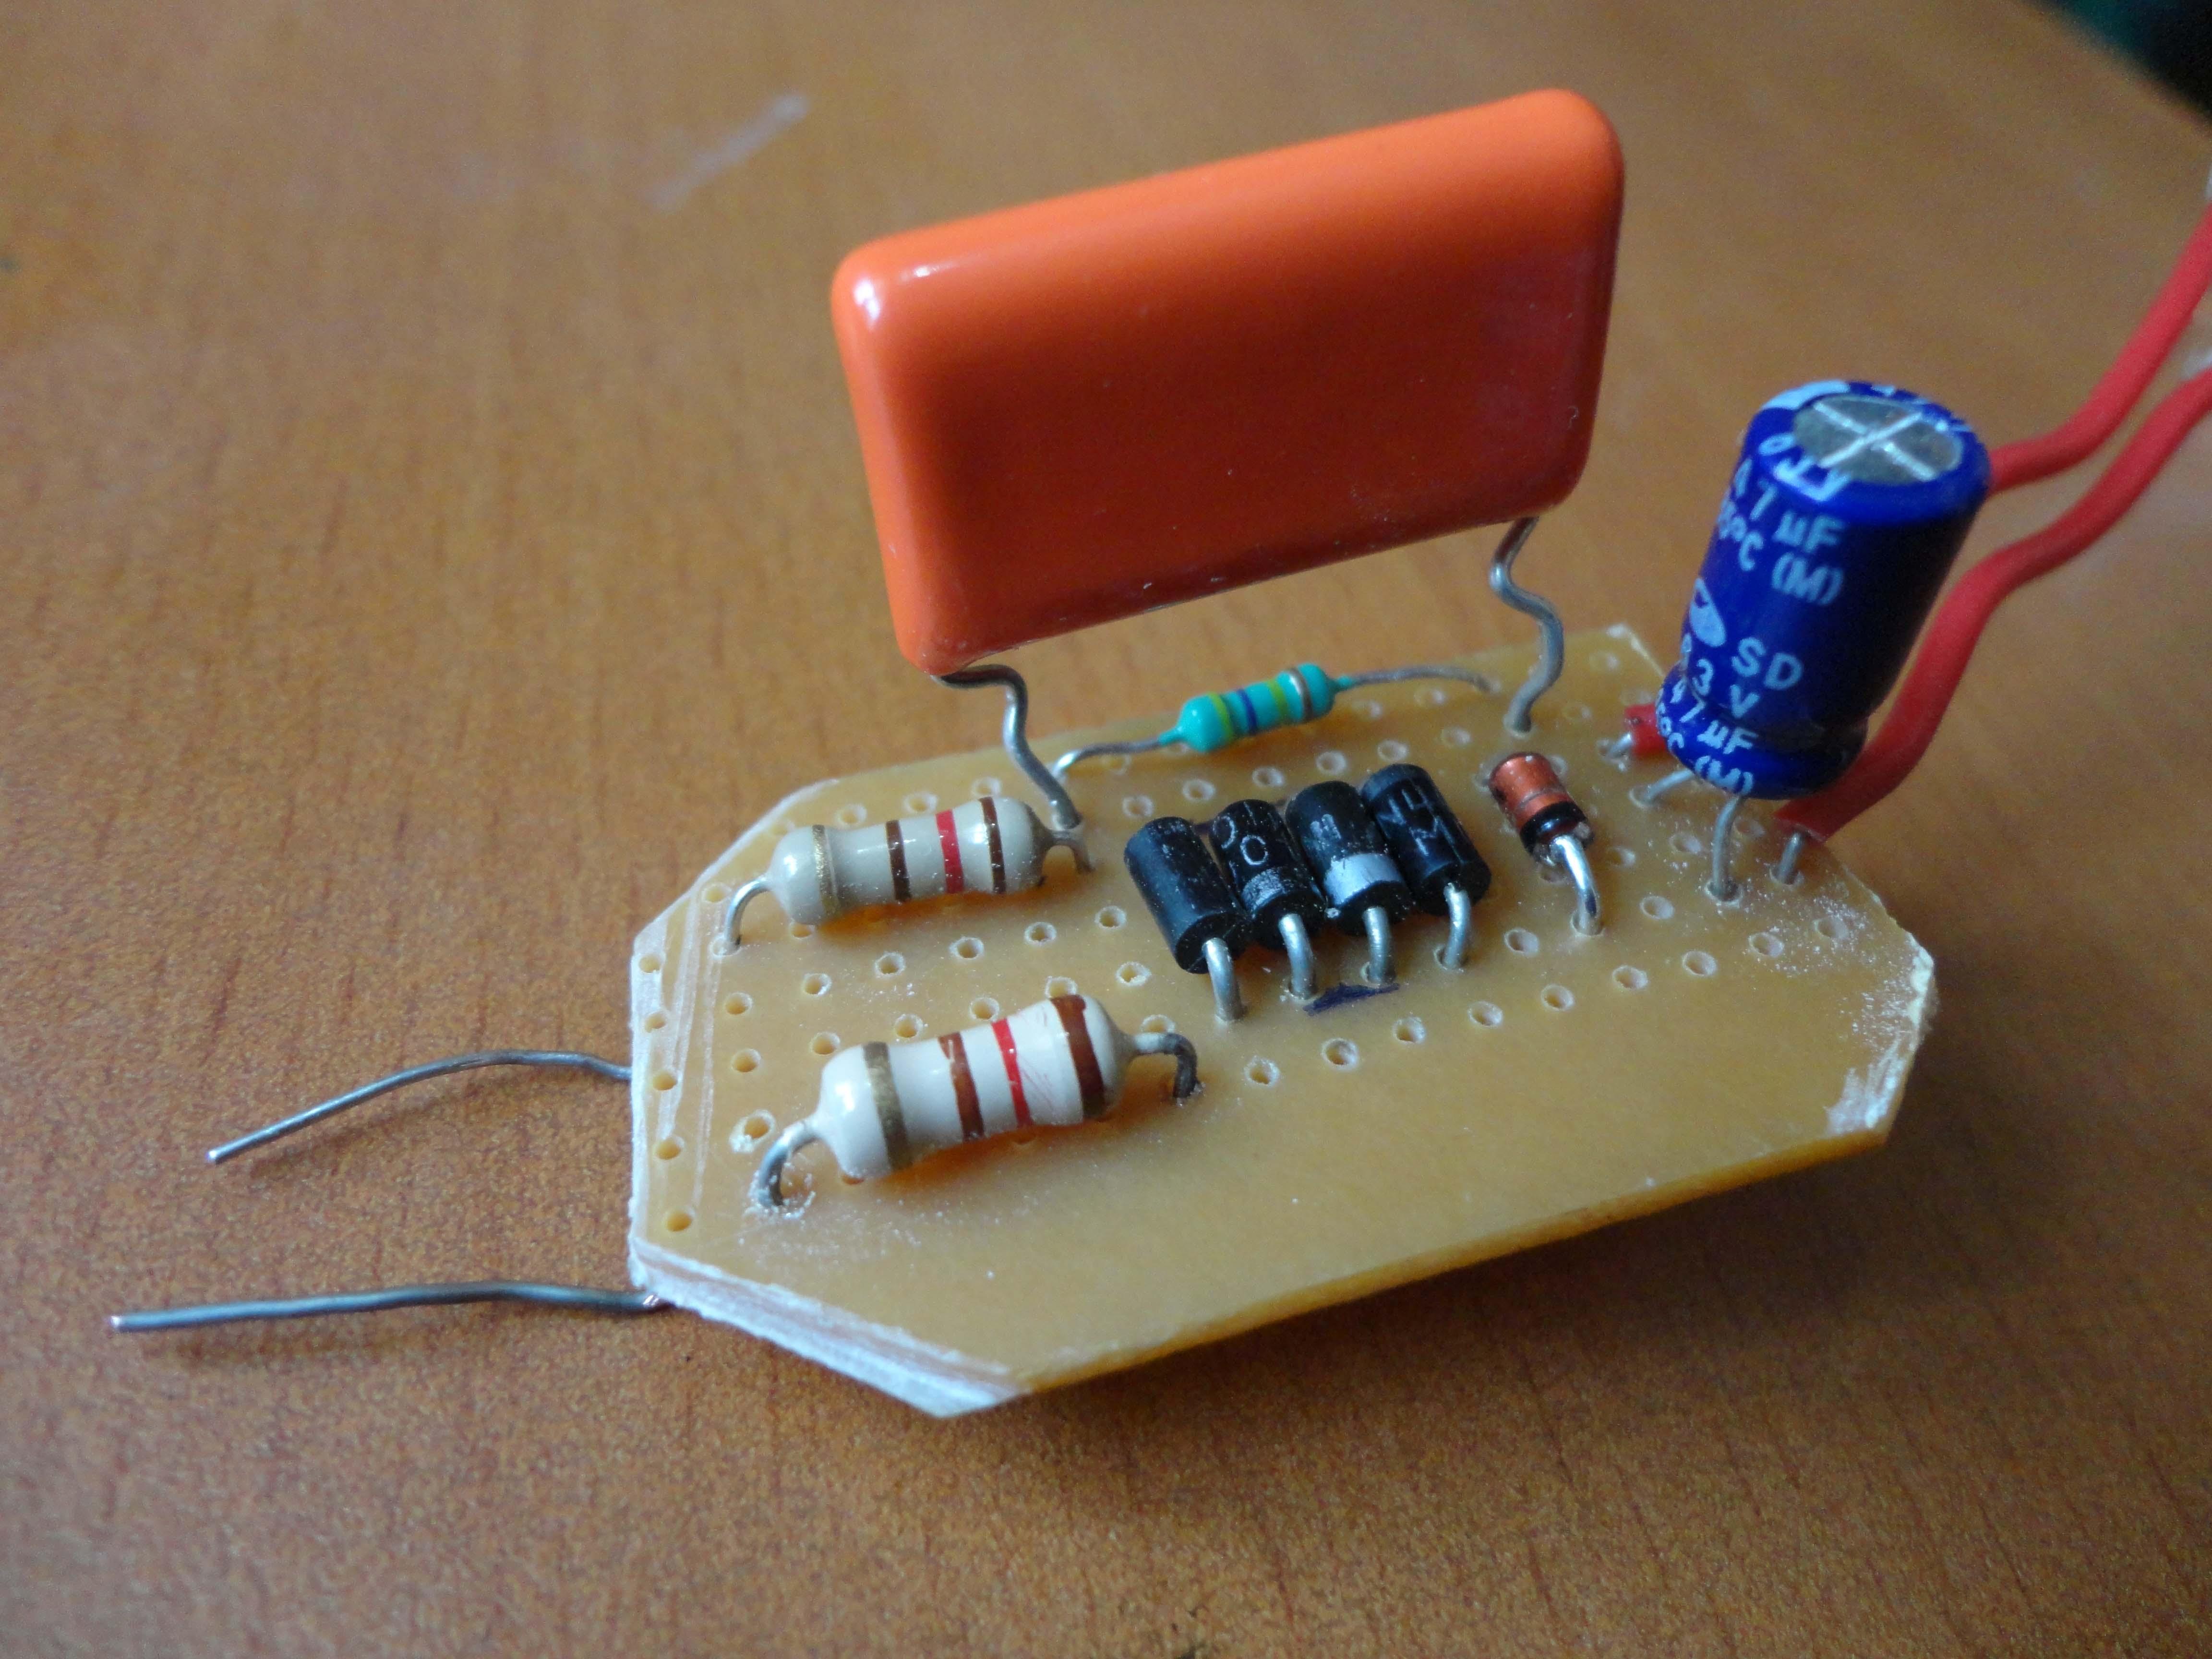 home power saver circuit diagram human vascular anatomy saving led lamp from scrap shriram spark dsc01784